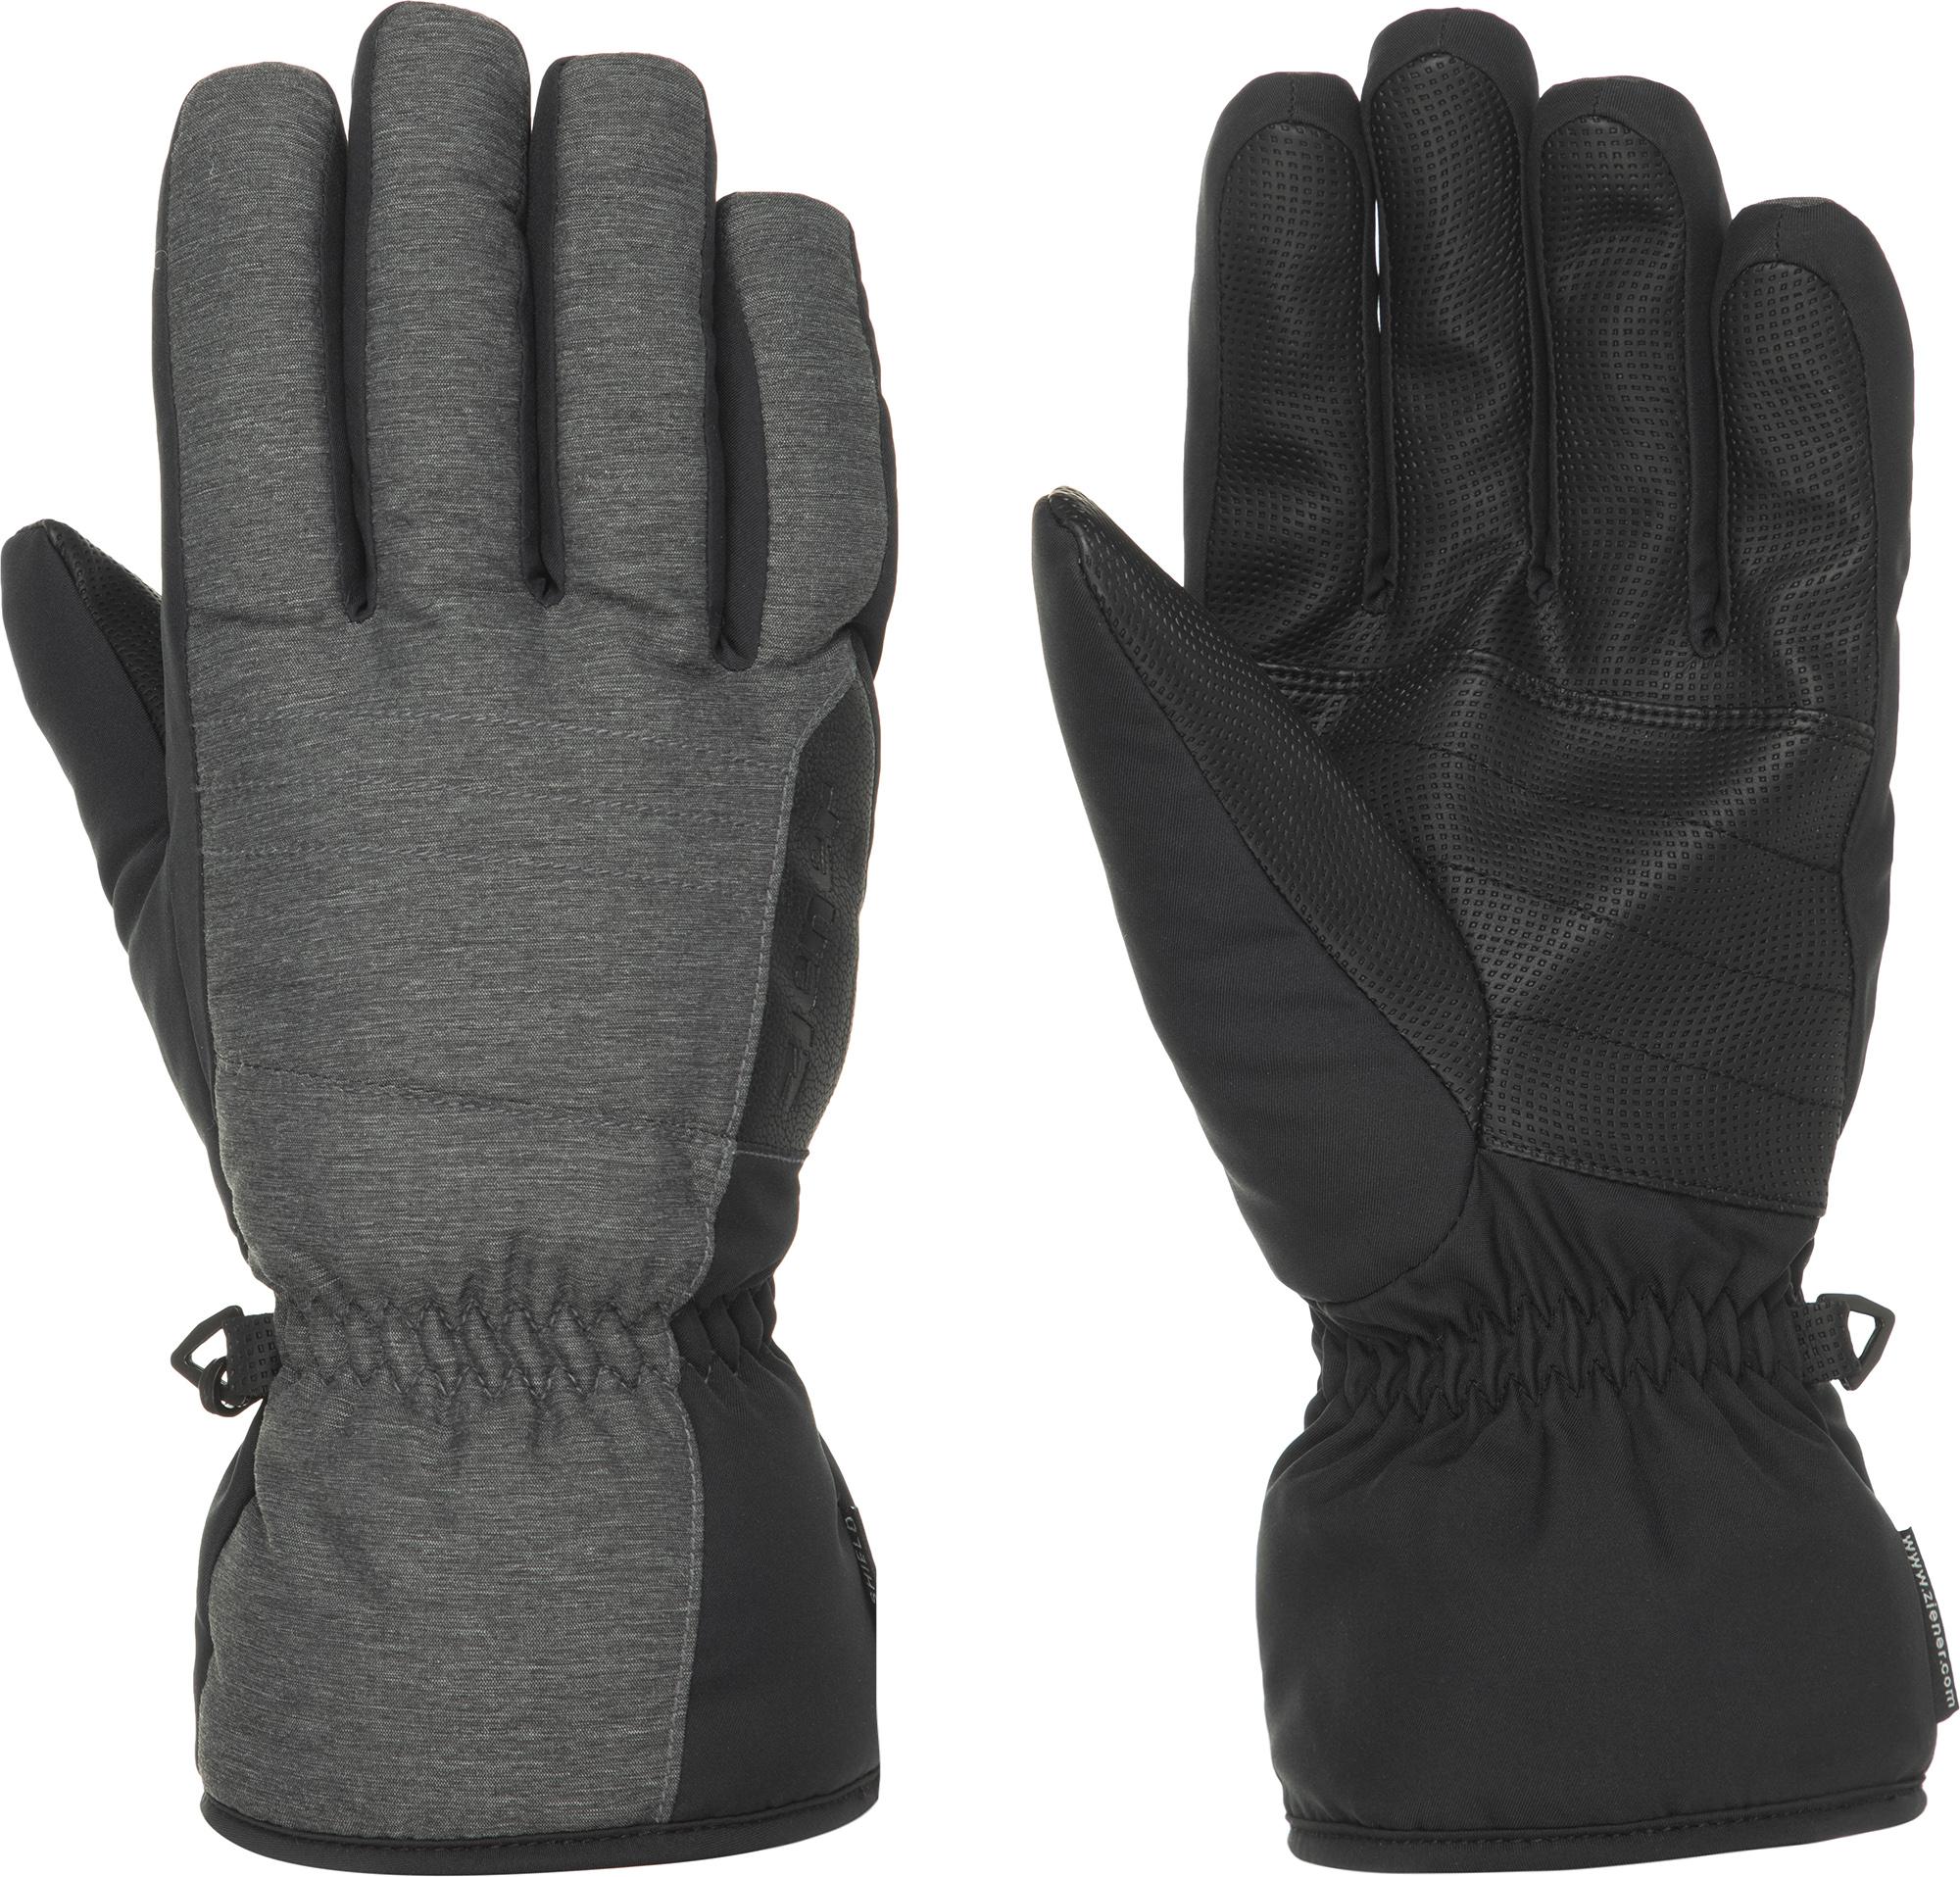 Ziener Перчатки мужские Ziener, размер 9 ziener перчатки мужские ziener gliss gtx размер 9